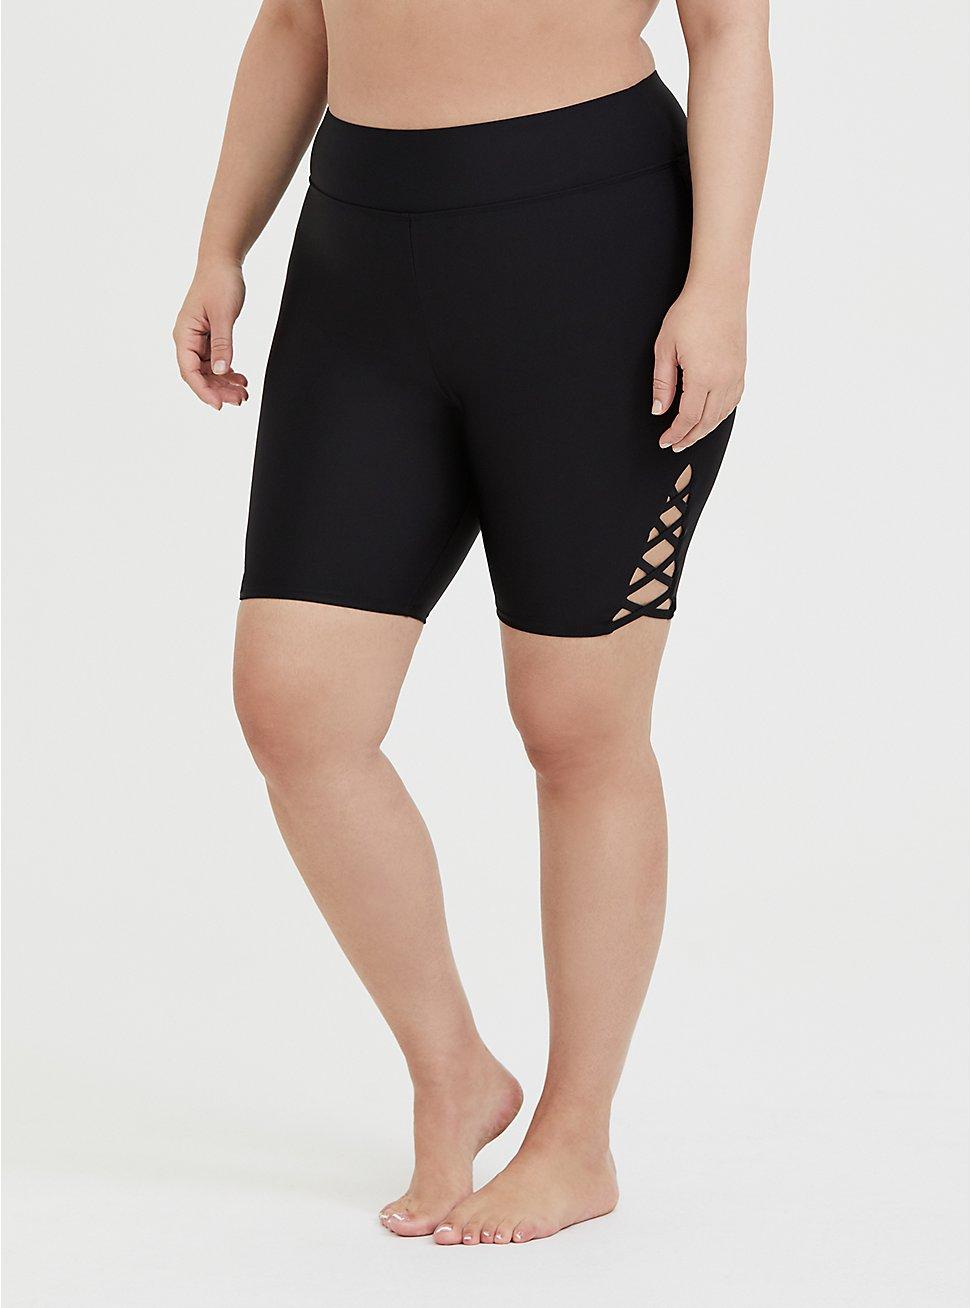 Black Lattice Side Swim Bike Short, DEEP BLACK, hi-res